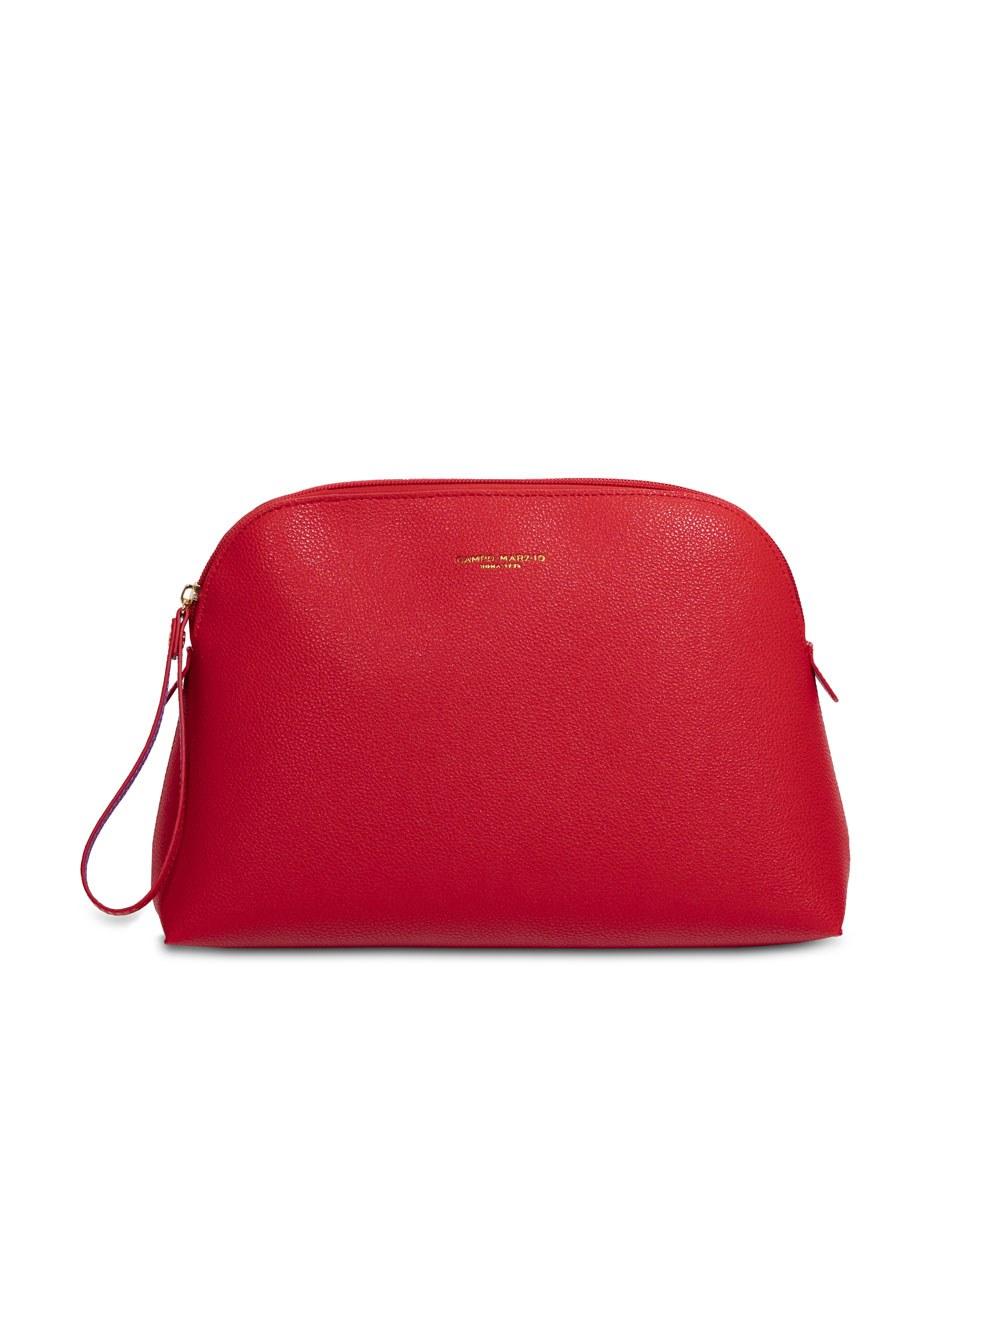 Bag with wristlet - Flame scarlet